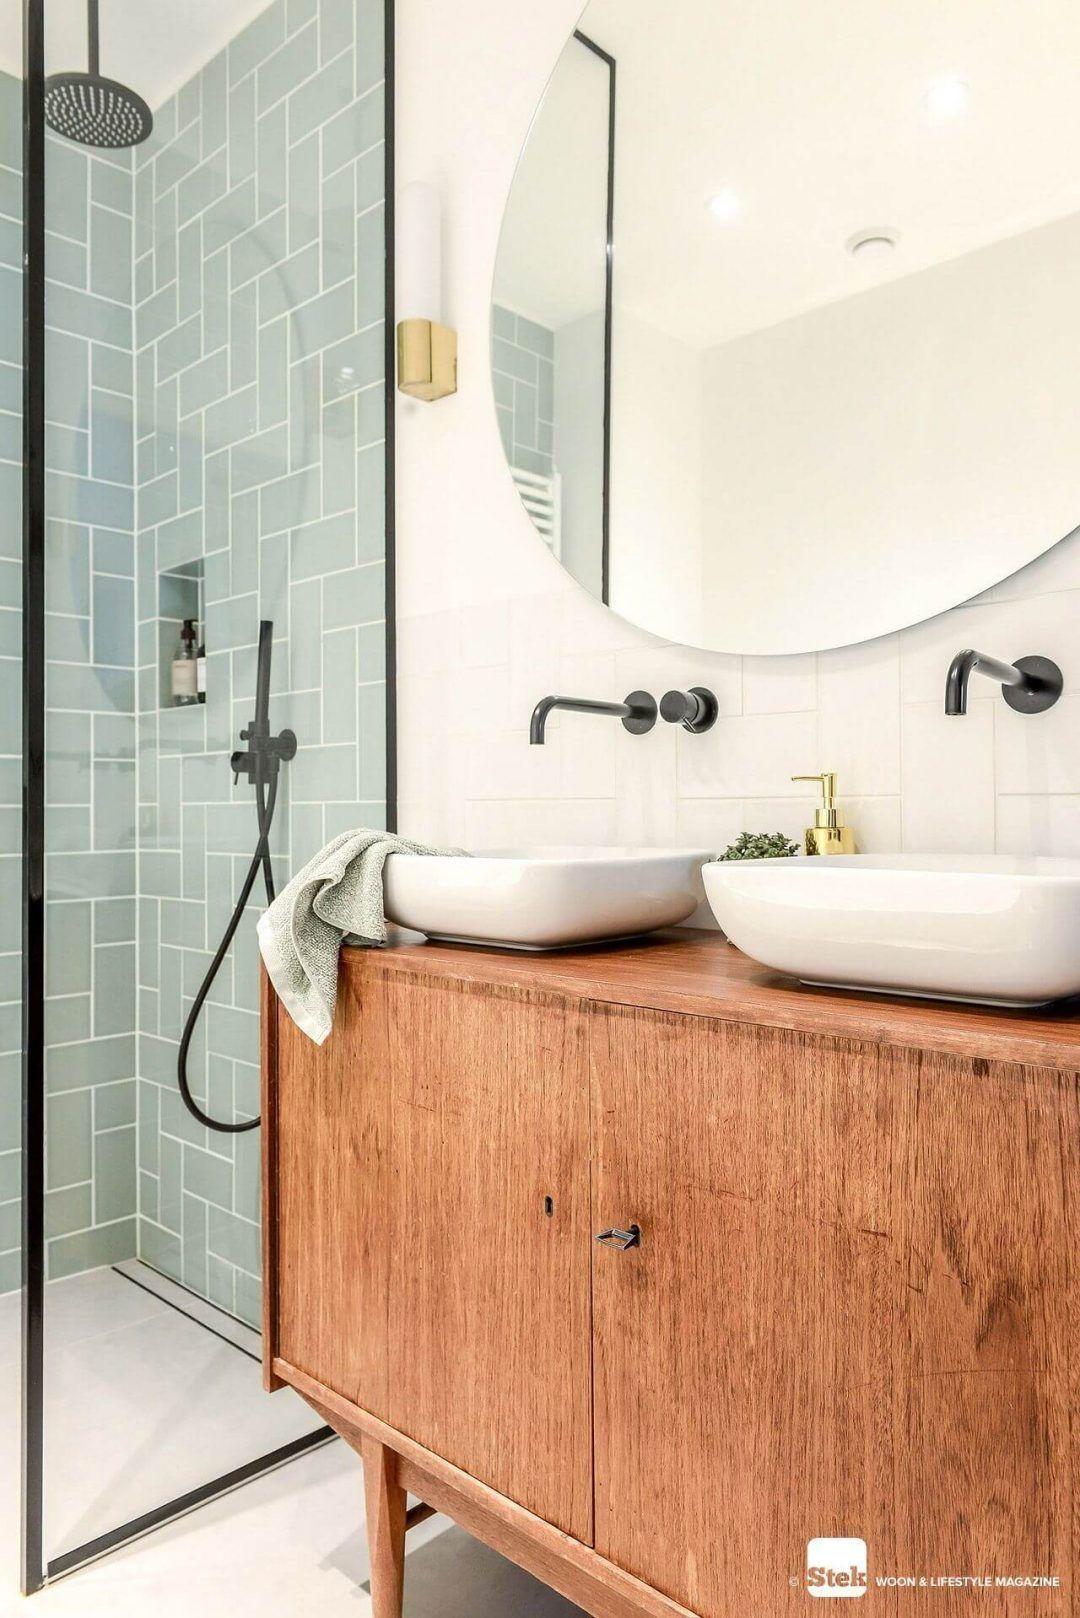 25 Eccentric Designs For Mid Century Modern Bathroom -